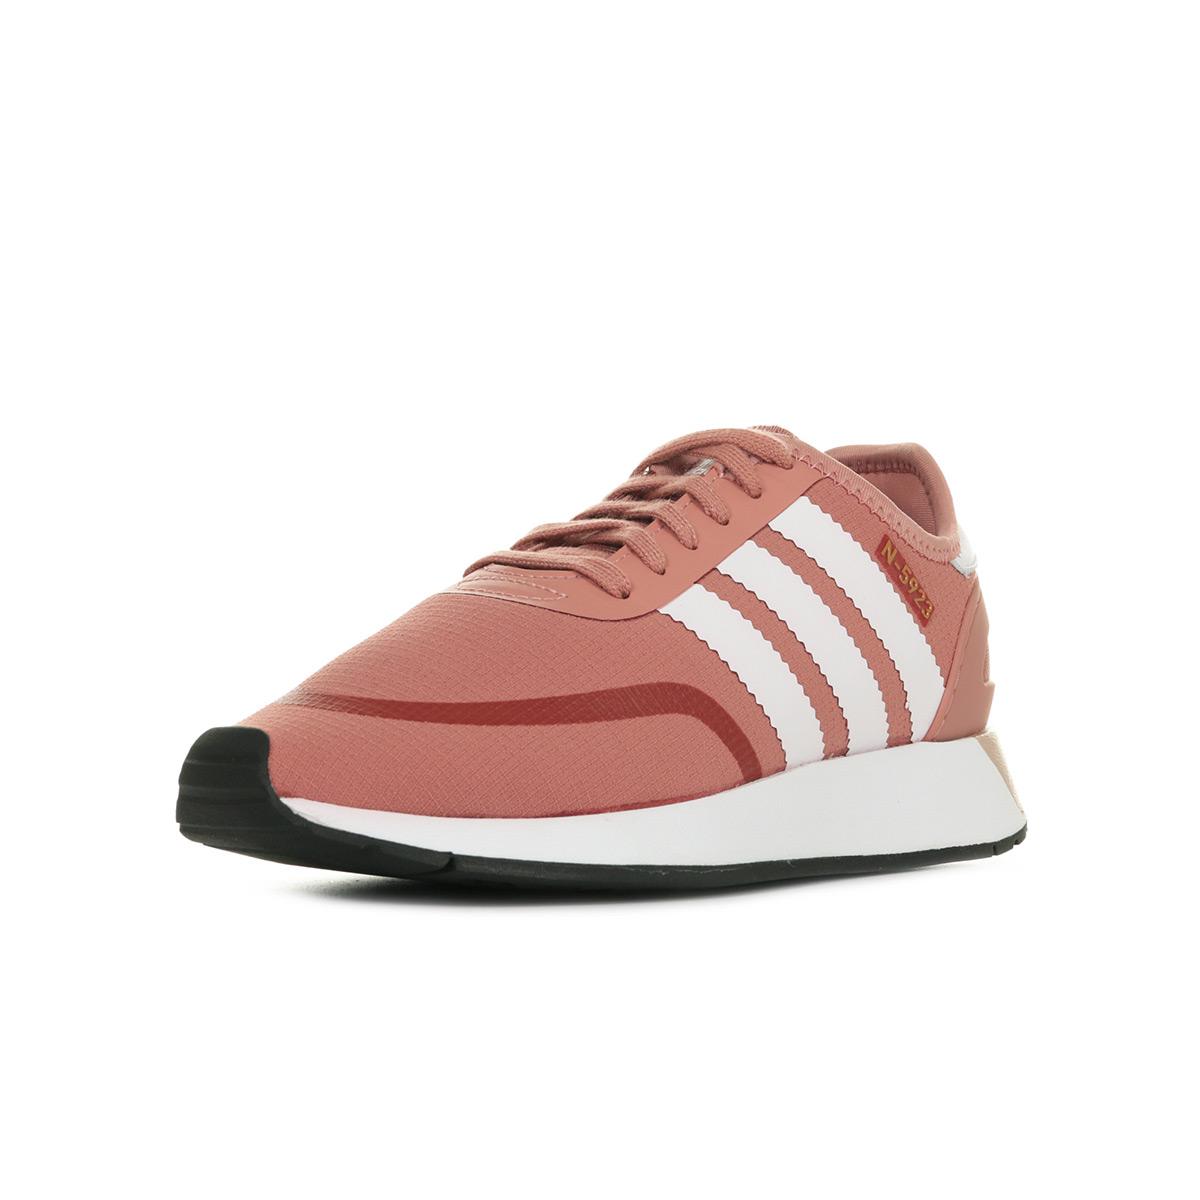 Nouveau Femme Chaussures De Sport Baskets Adidas Originals N-5923 AQ0267